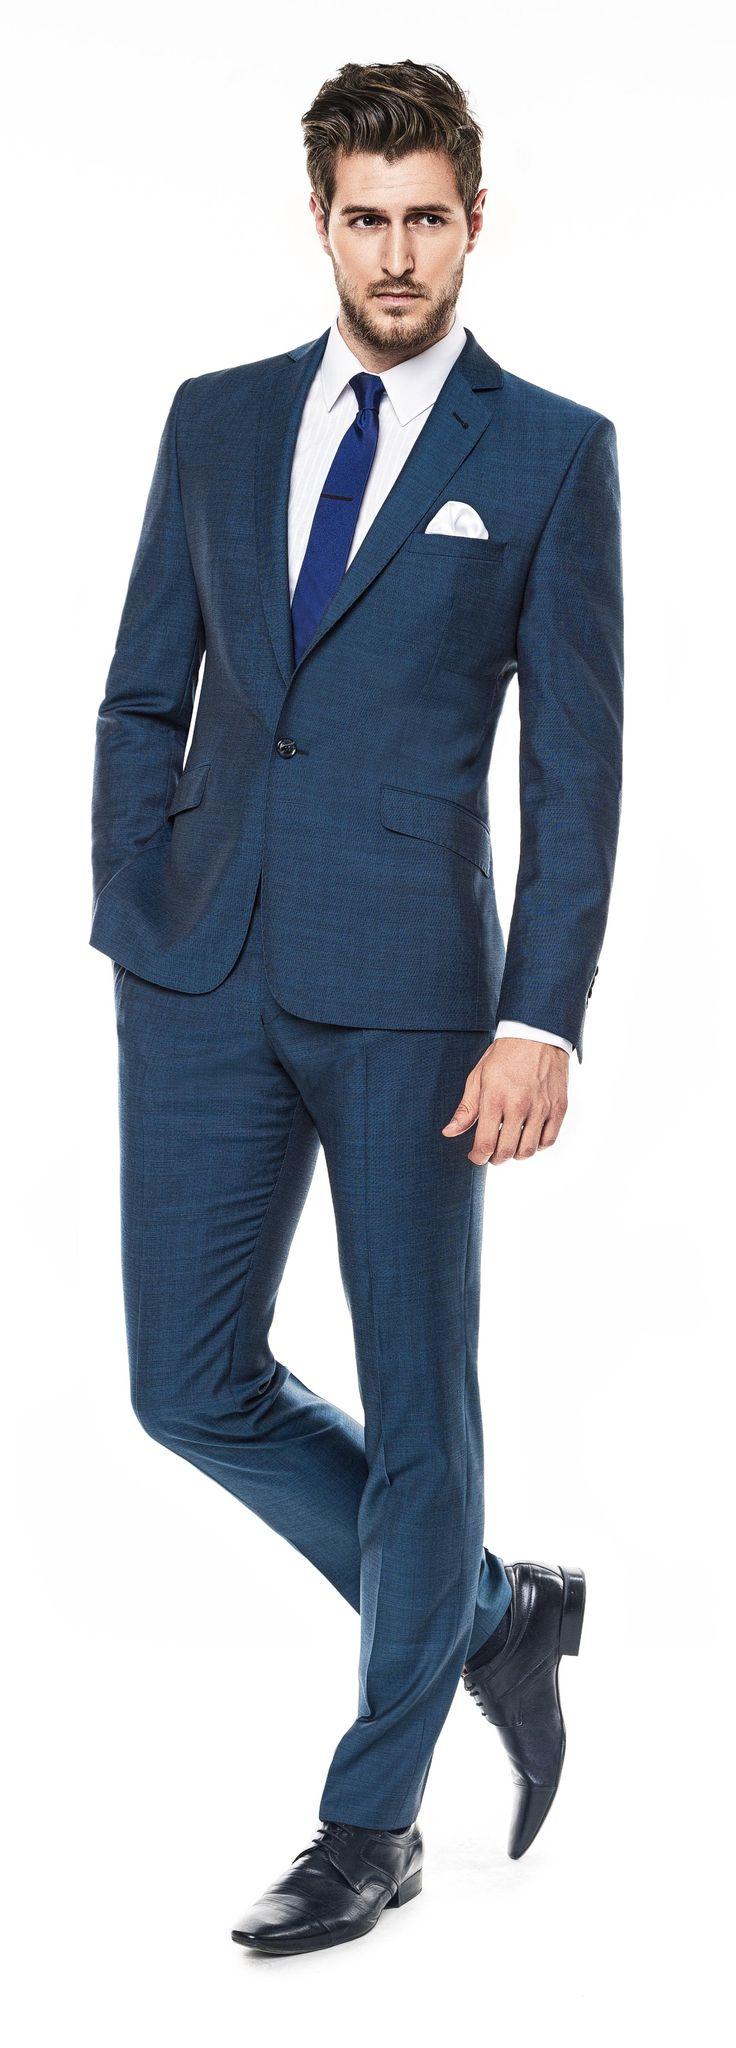 Kolekcja Giacomo Conti 2014 - granatowy garnitur Marcus 2 E14/17B, biała koszula męska Michele 14/04/09. #giacomoconti